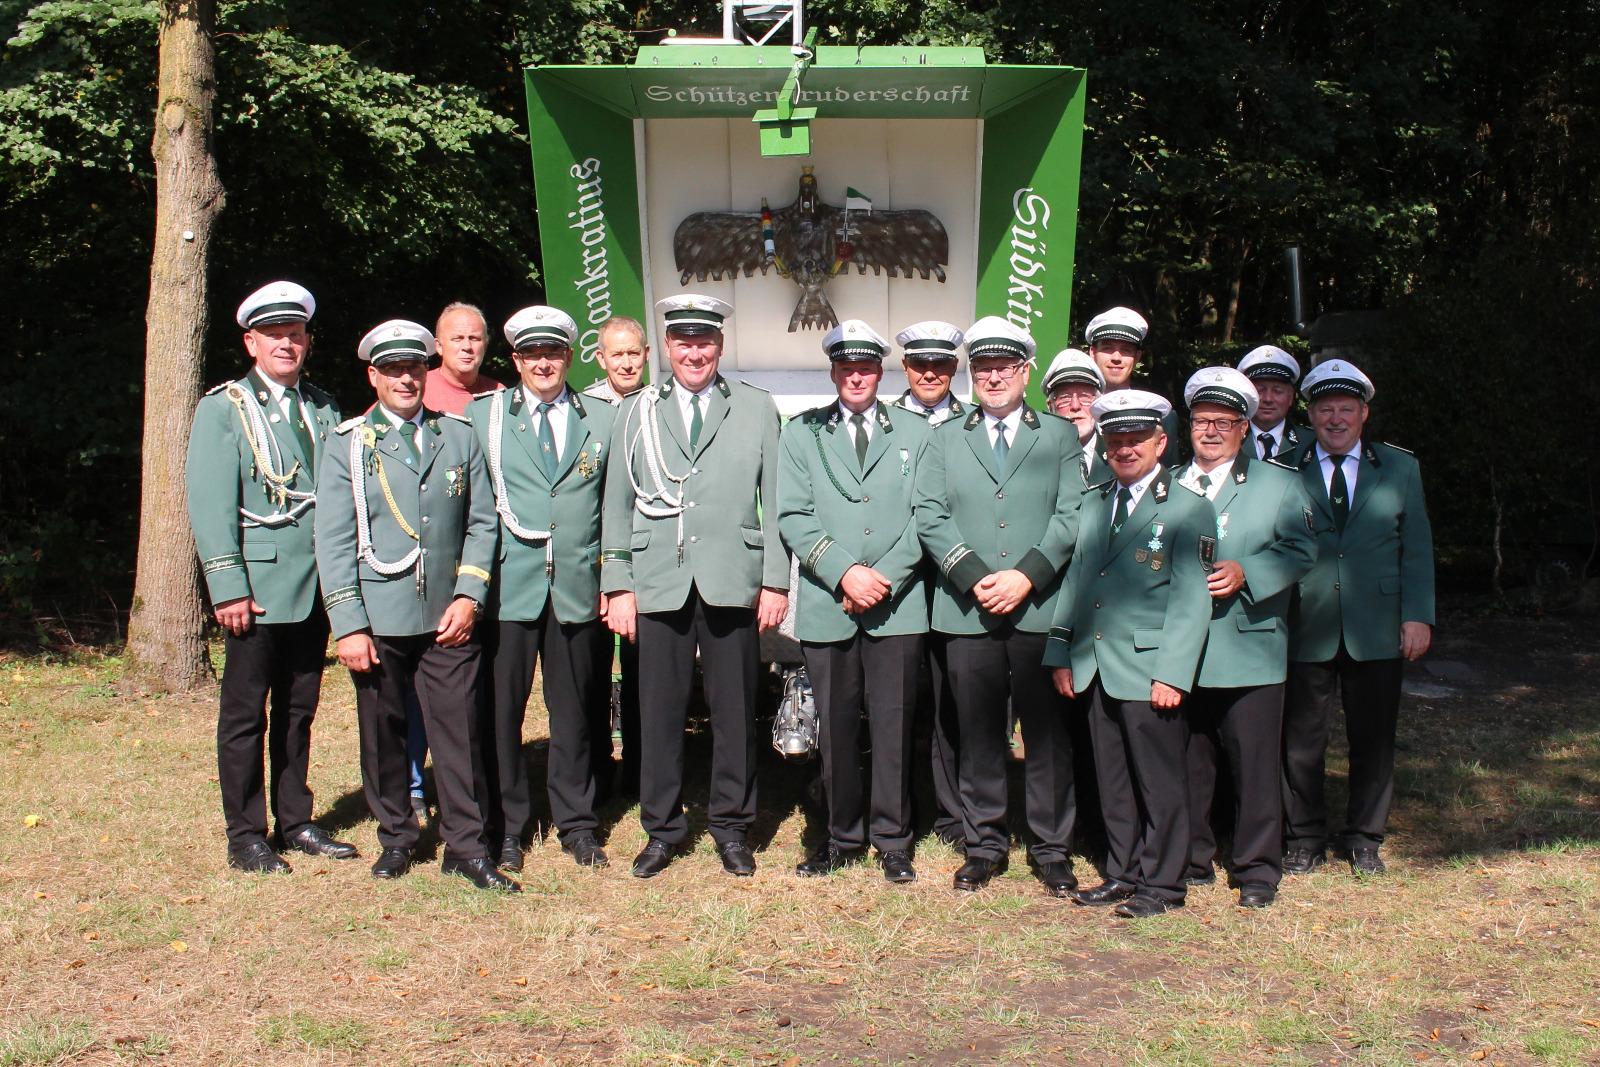 Schützenverein Schützenbruderschaft St. Pankratius Südkirchen - Schießgruppe 2016